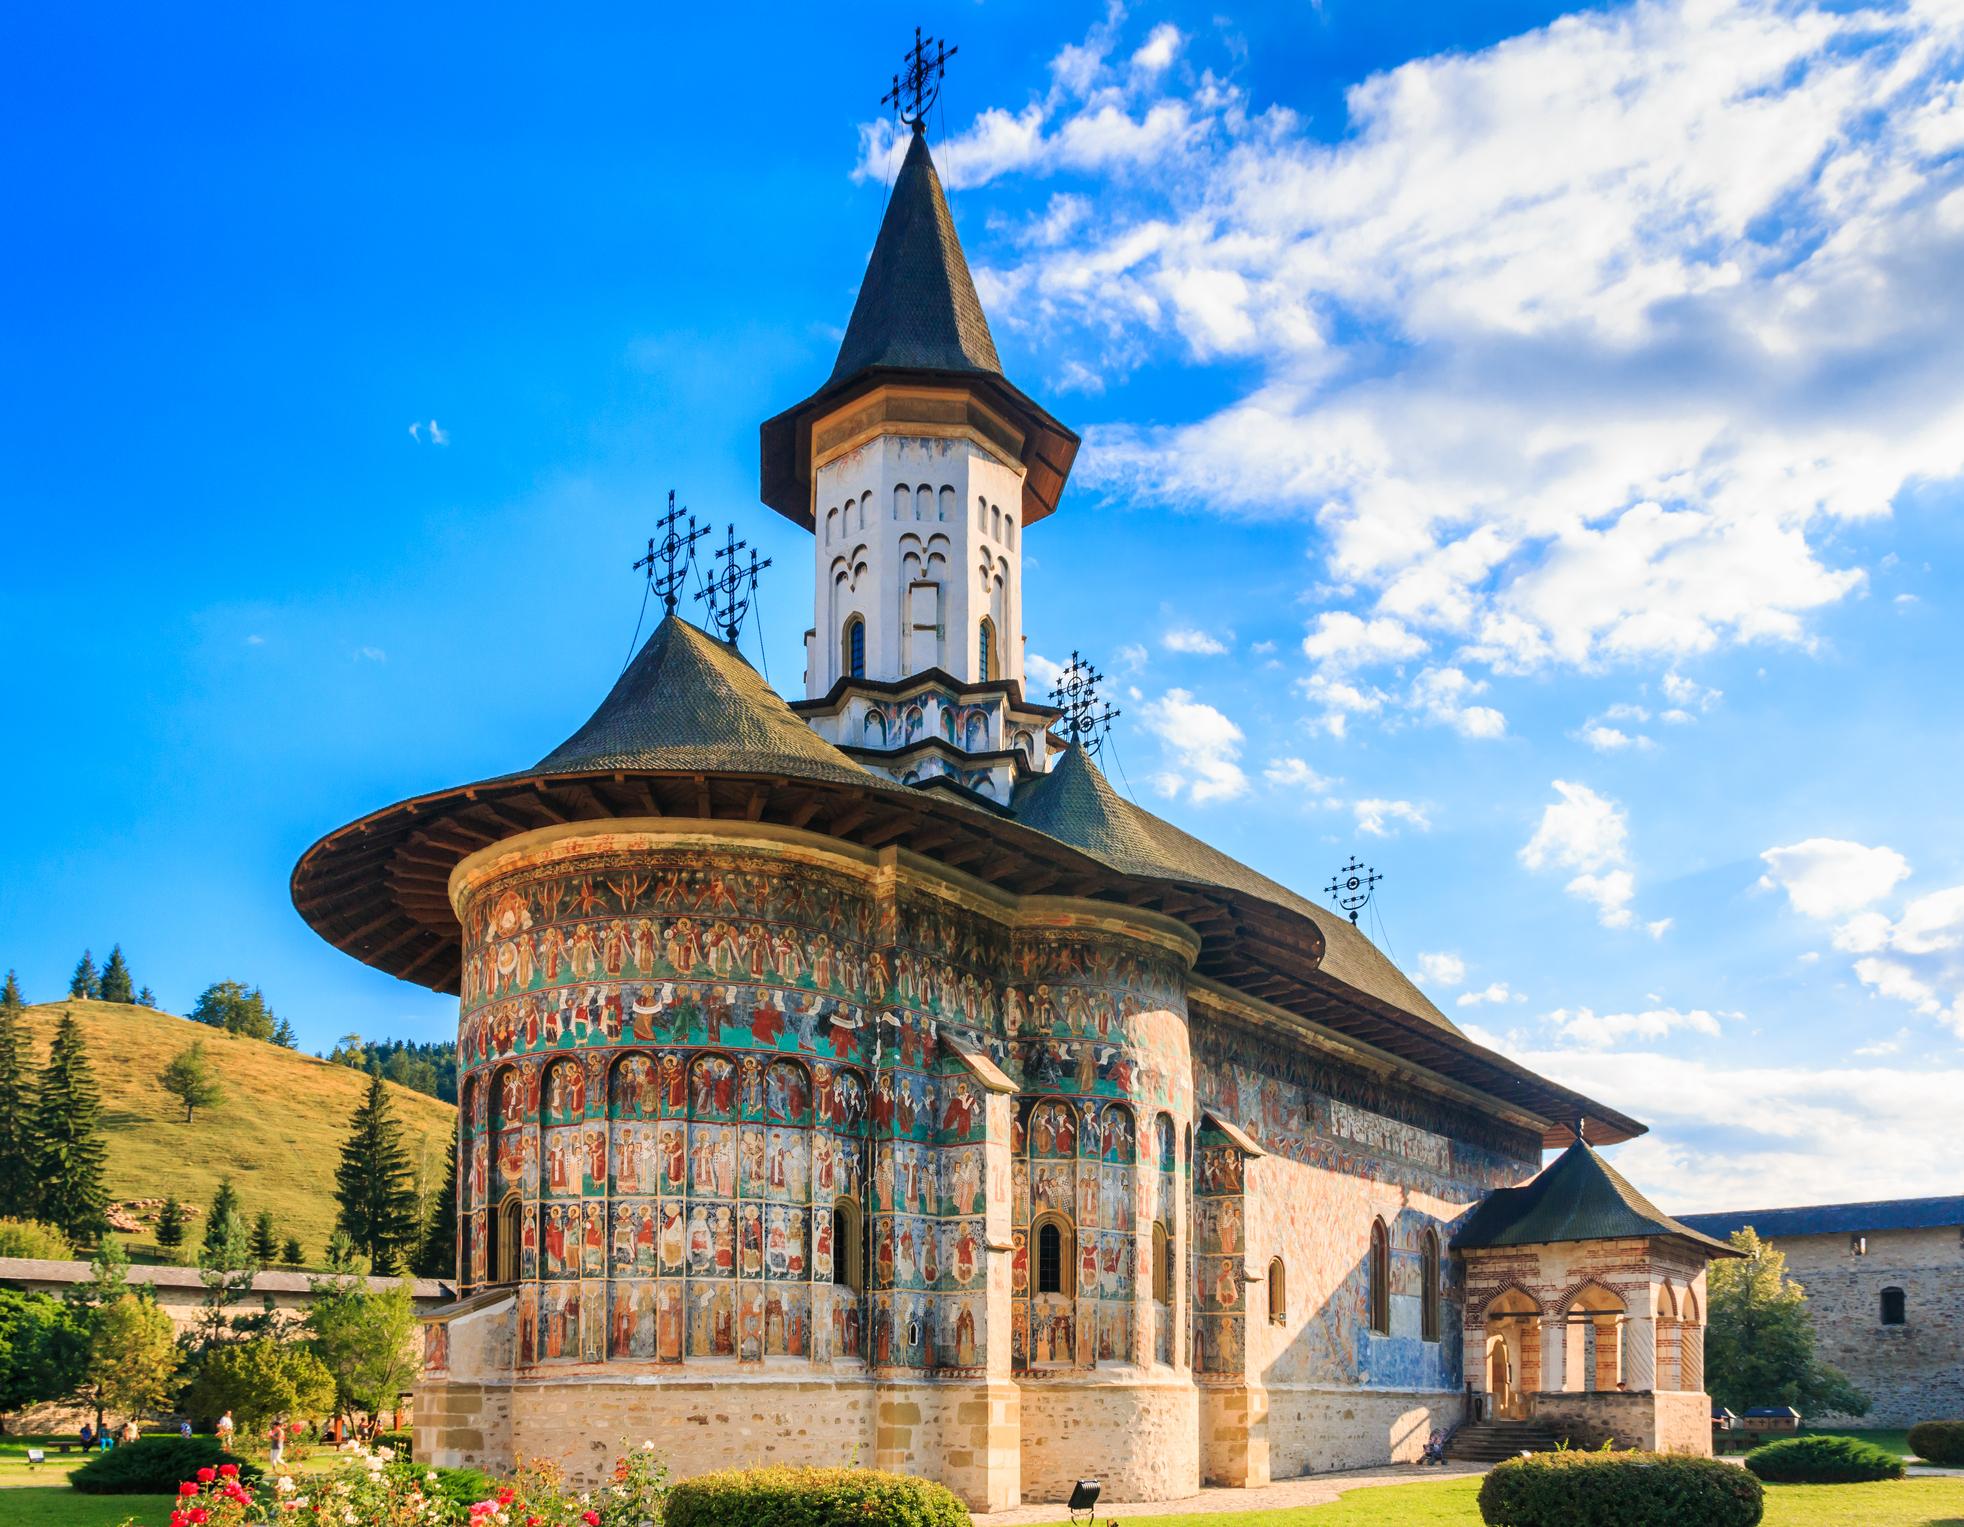 Beyond Dracula - Timisoara, RomaniaRequests: beyonddracula@navigo360.combeyonddracula.com+40 745 074 177Eastern +7 hoursPacific +10 hours